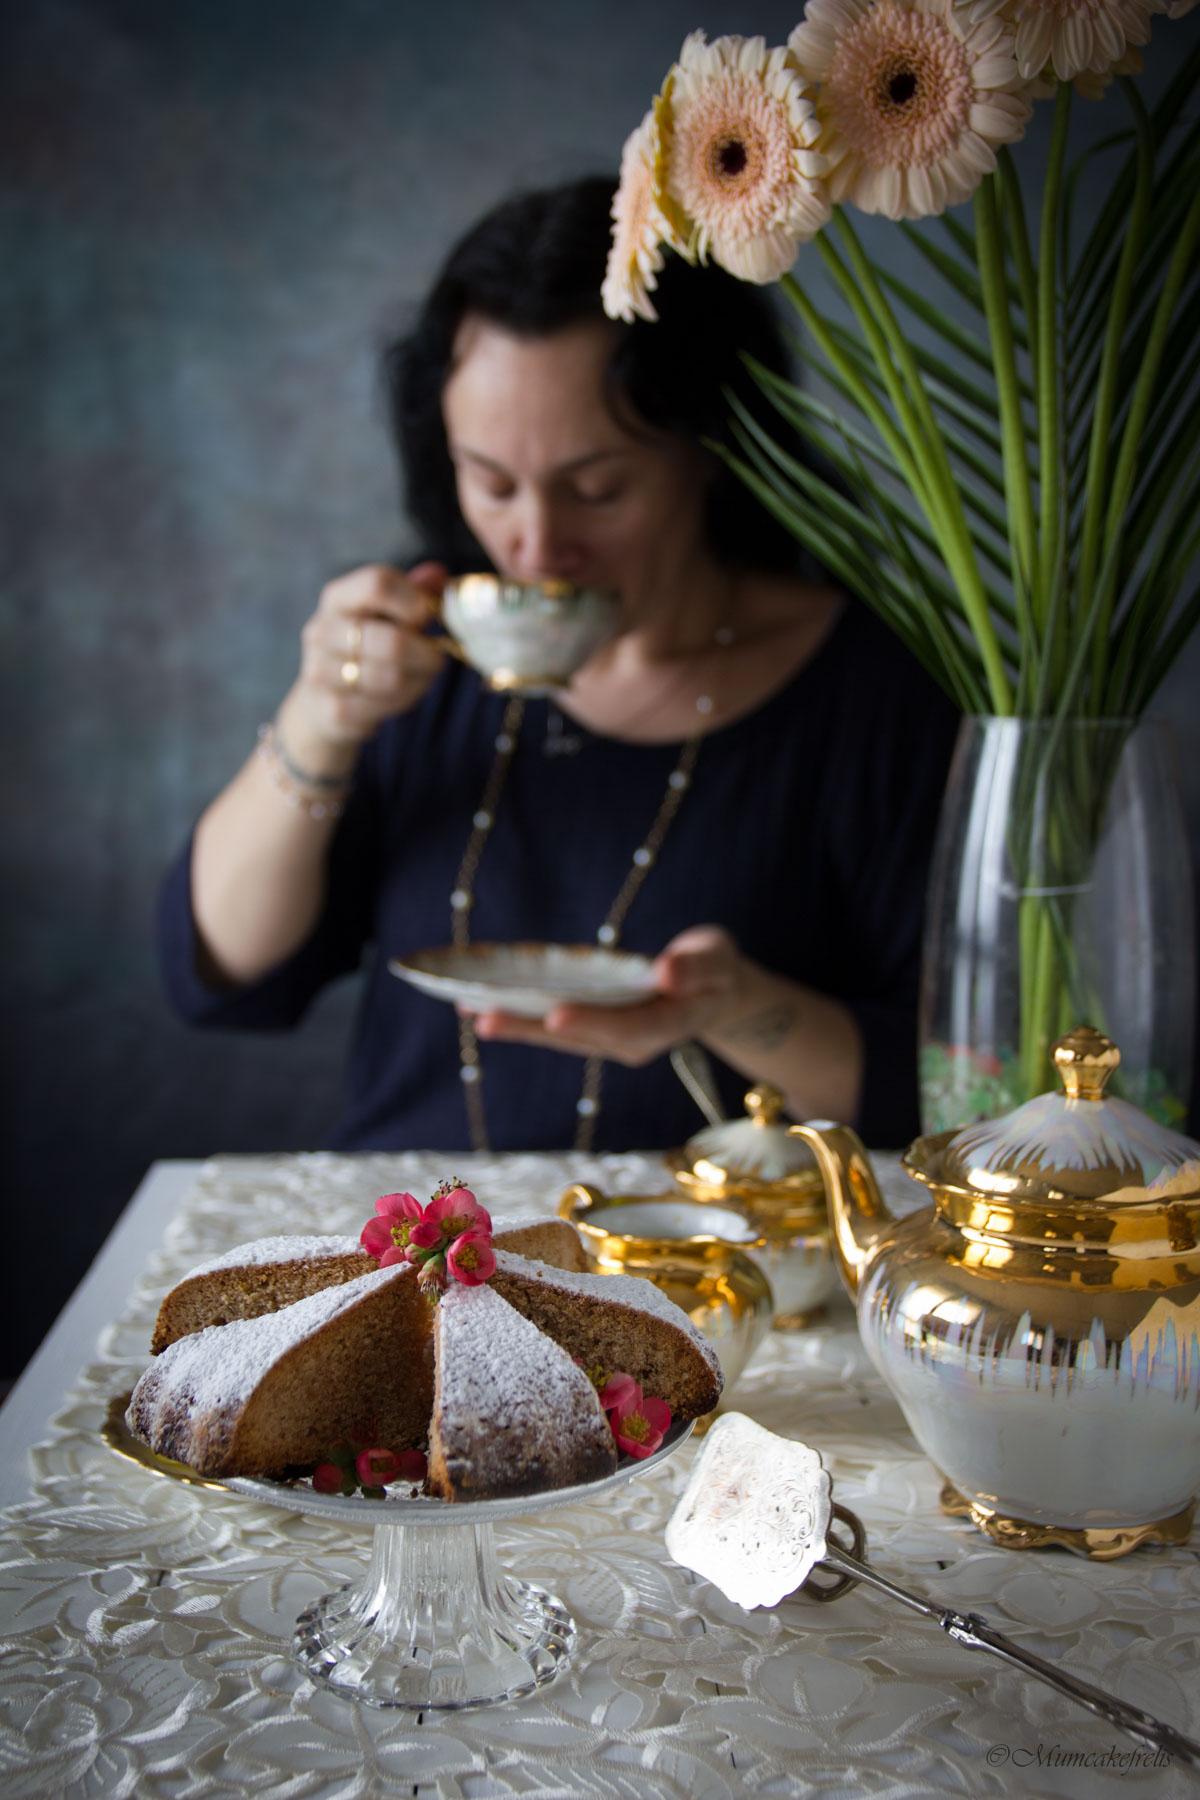 seed cake con carvi